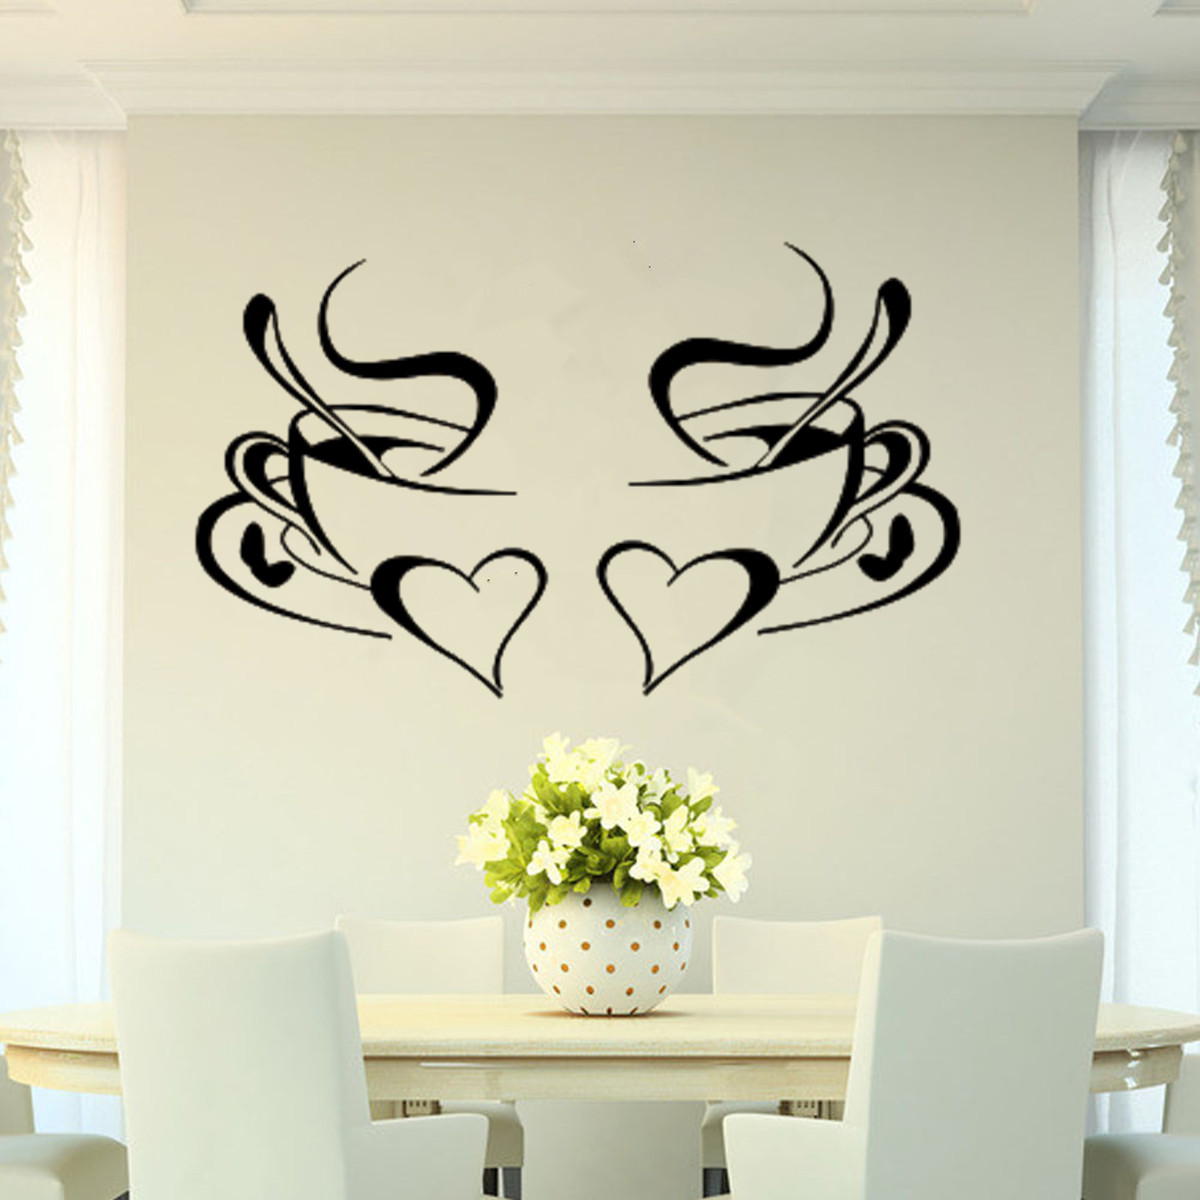 wandaufkleber wandtattoo wandsticker kaffee tasse herz. Black Bedroom Furniture Sets. Home Design Ideas